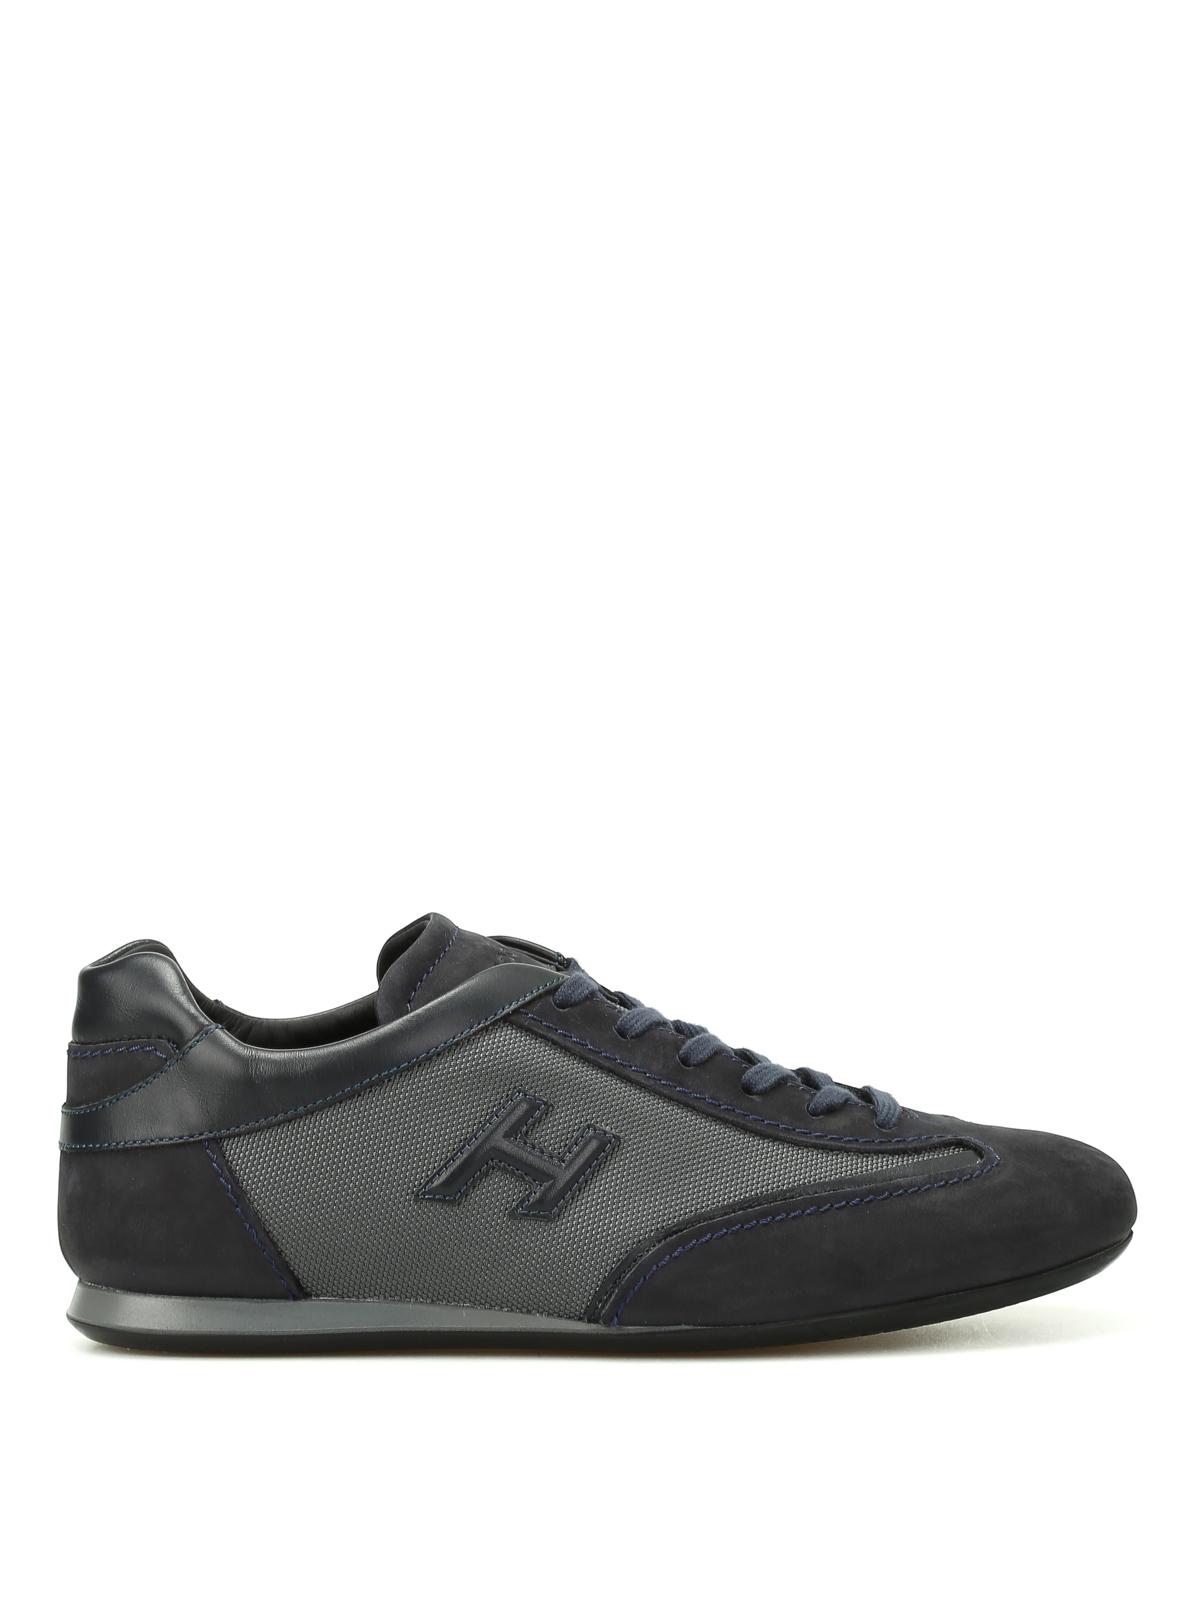 Sneakers Hogan - Olympia blu in nabuk - HXM0570I972H1F356Z   iKRIX.com